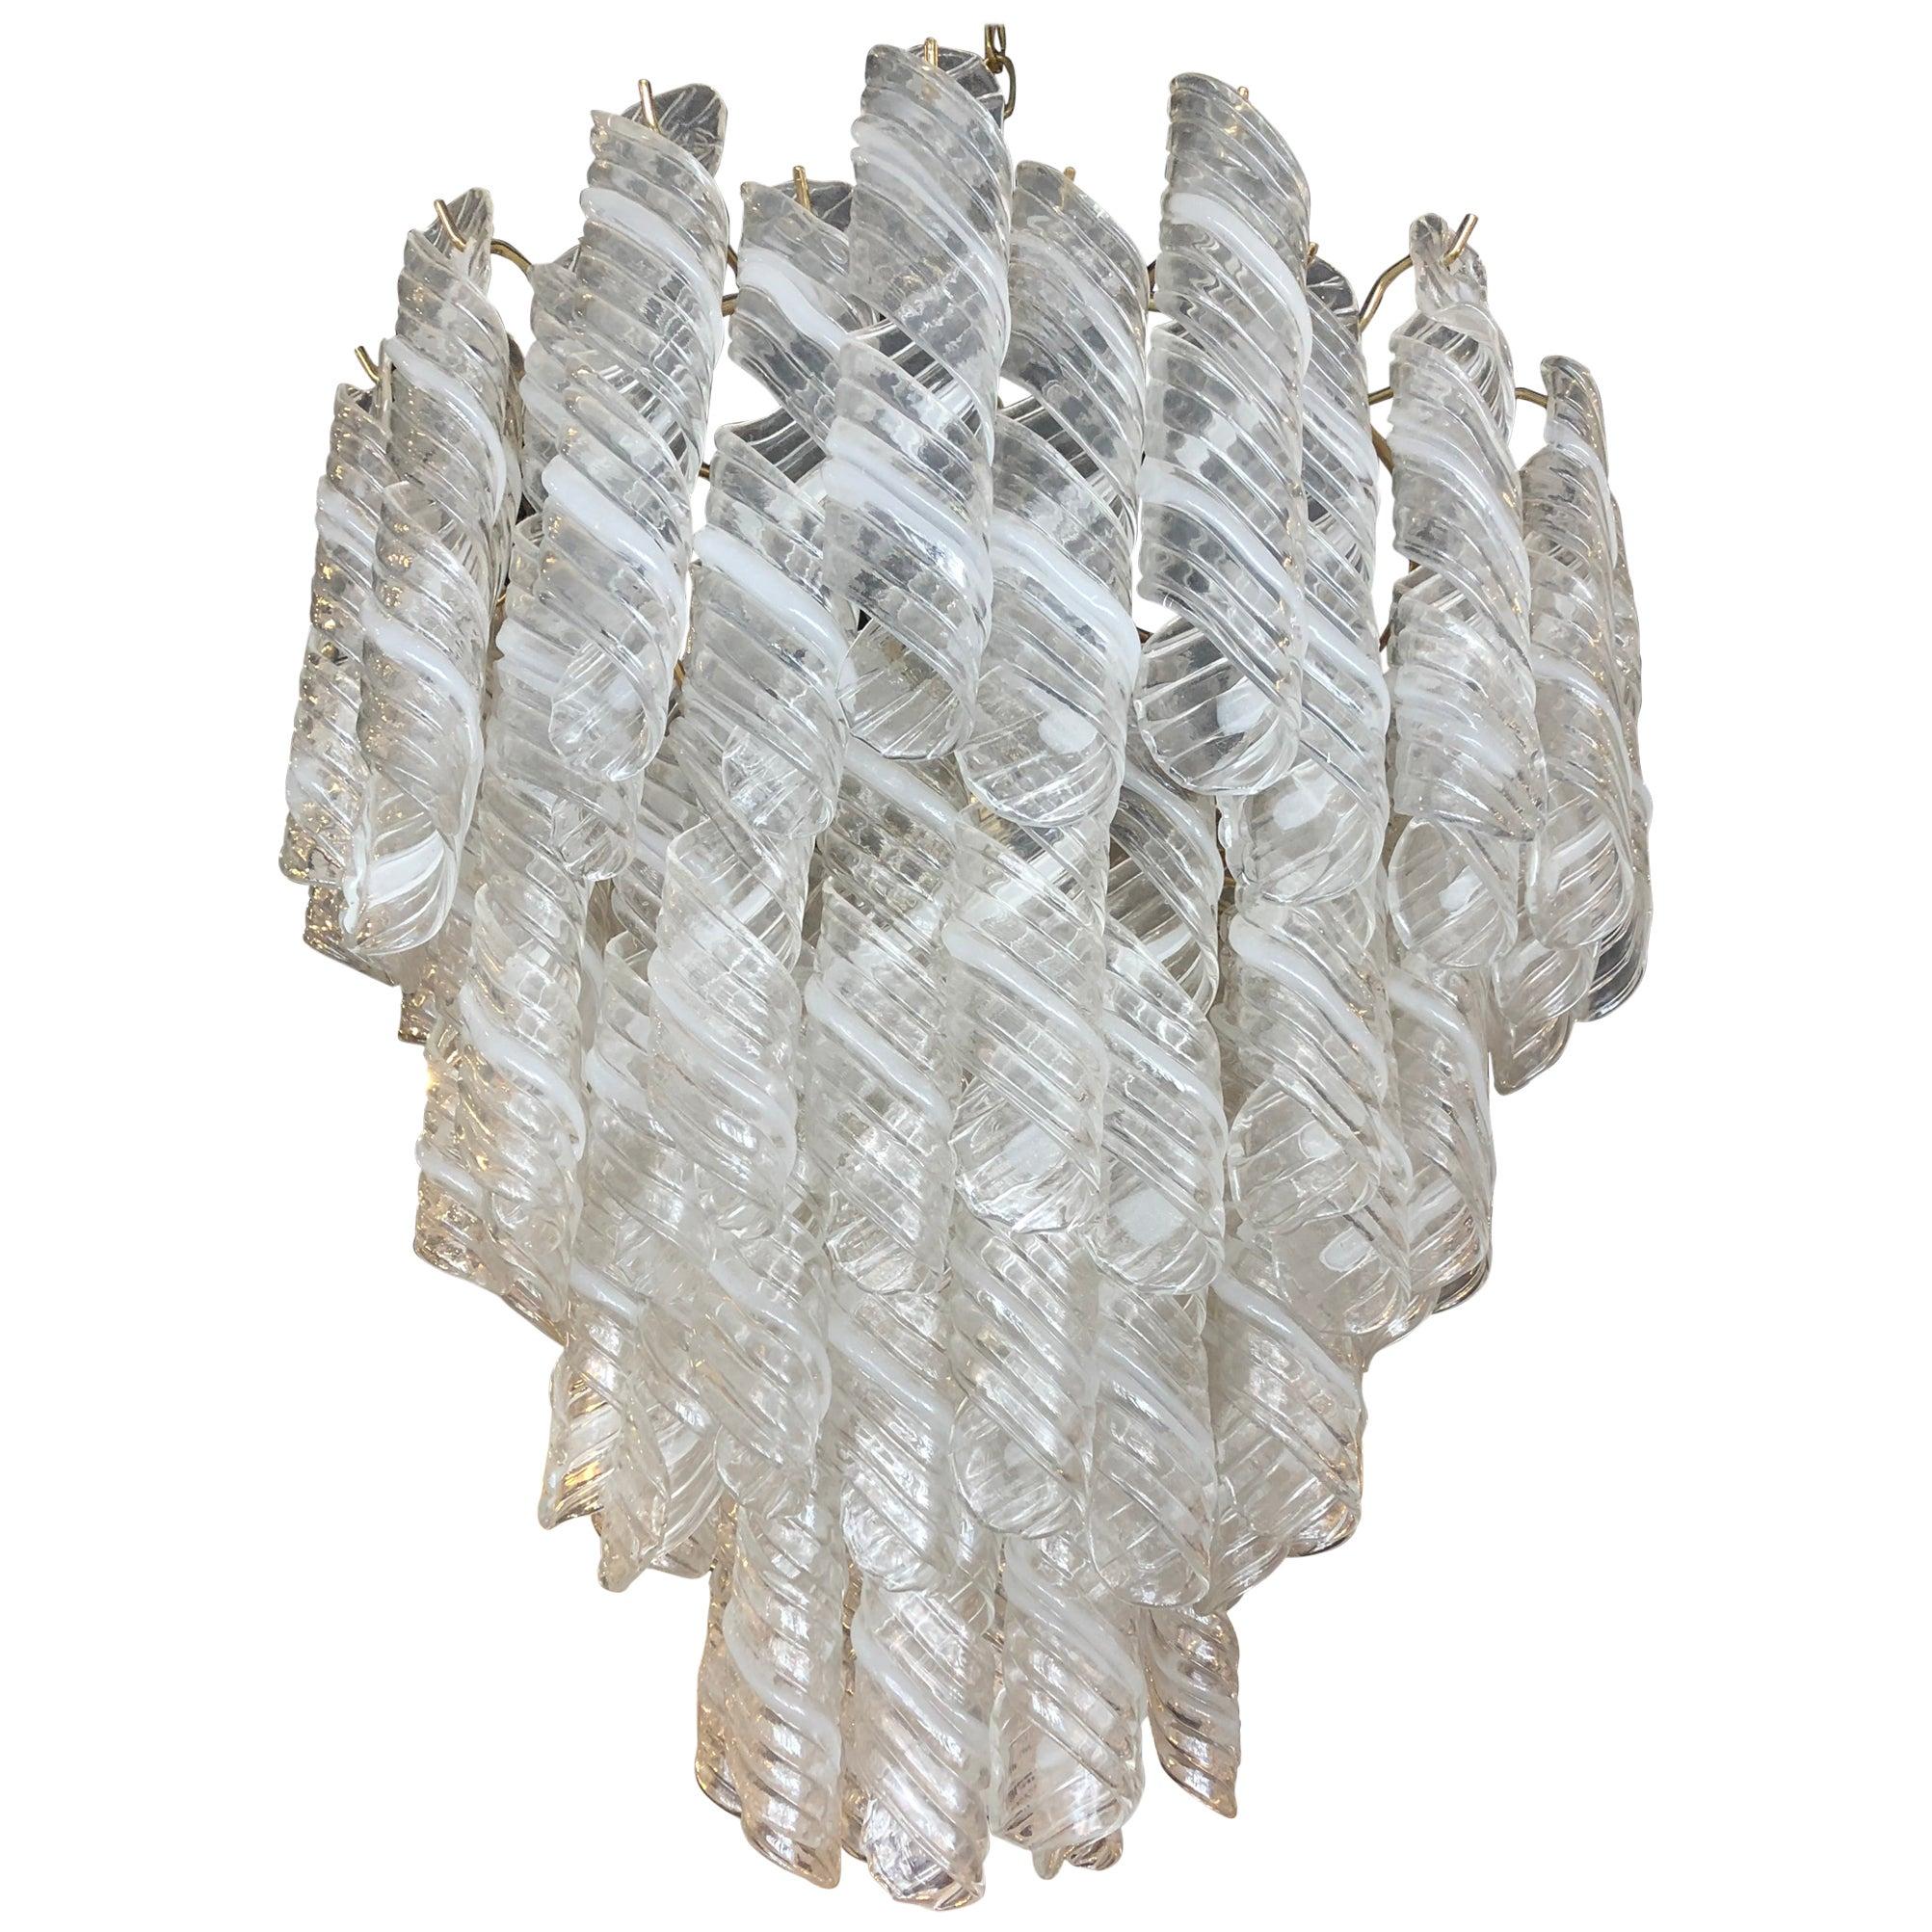 Italian Modern Hand Blown Glass and Polished Nickel Chandelier, Mazzega